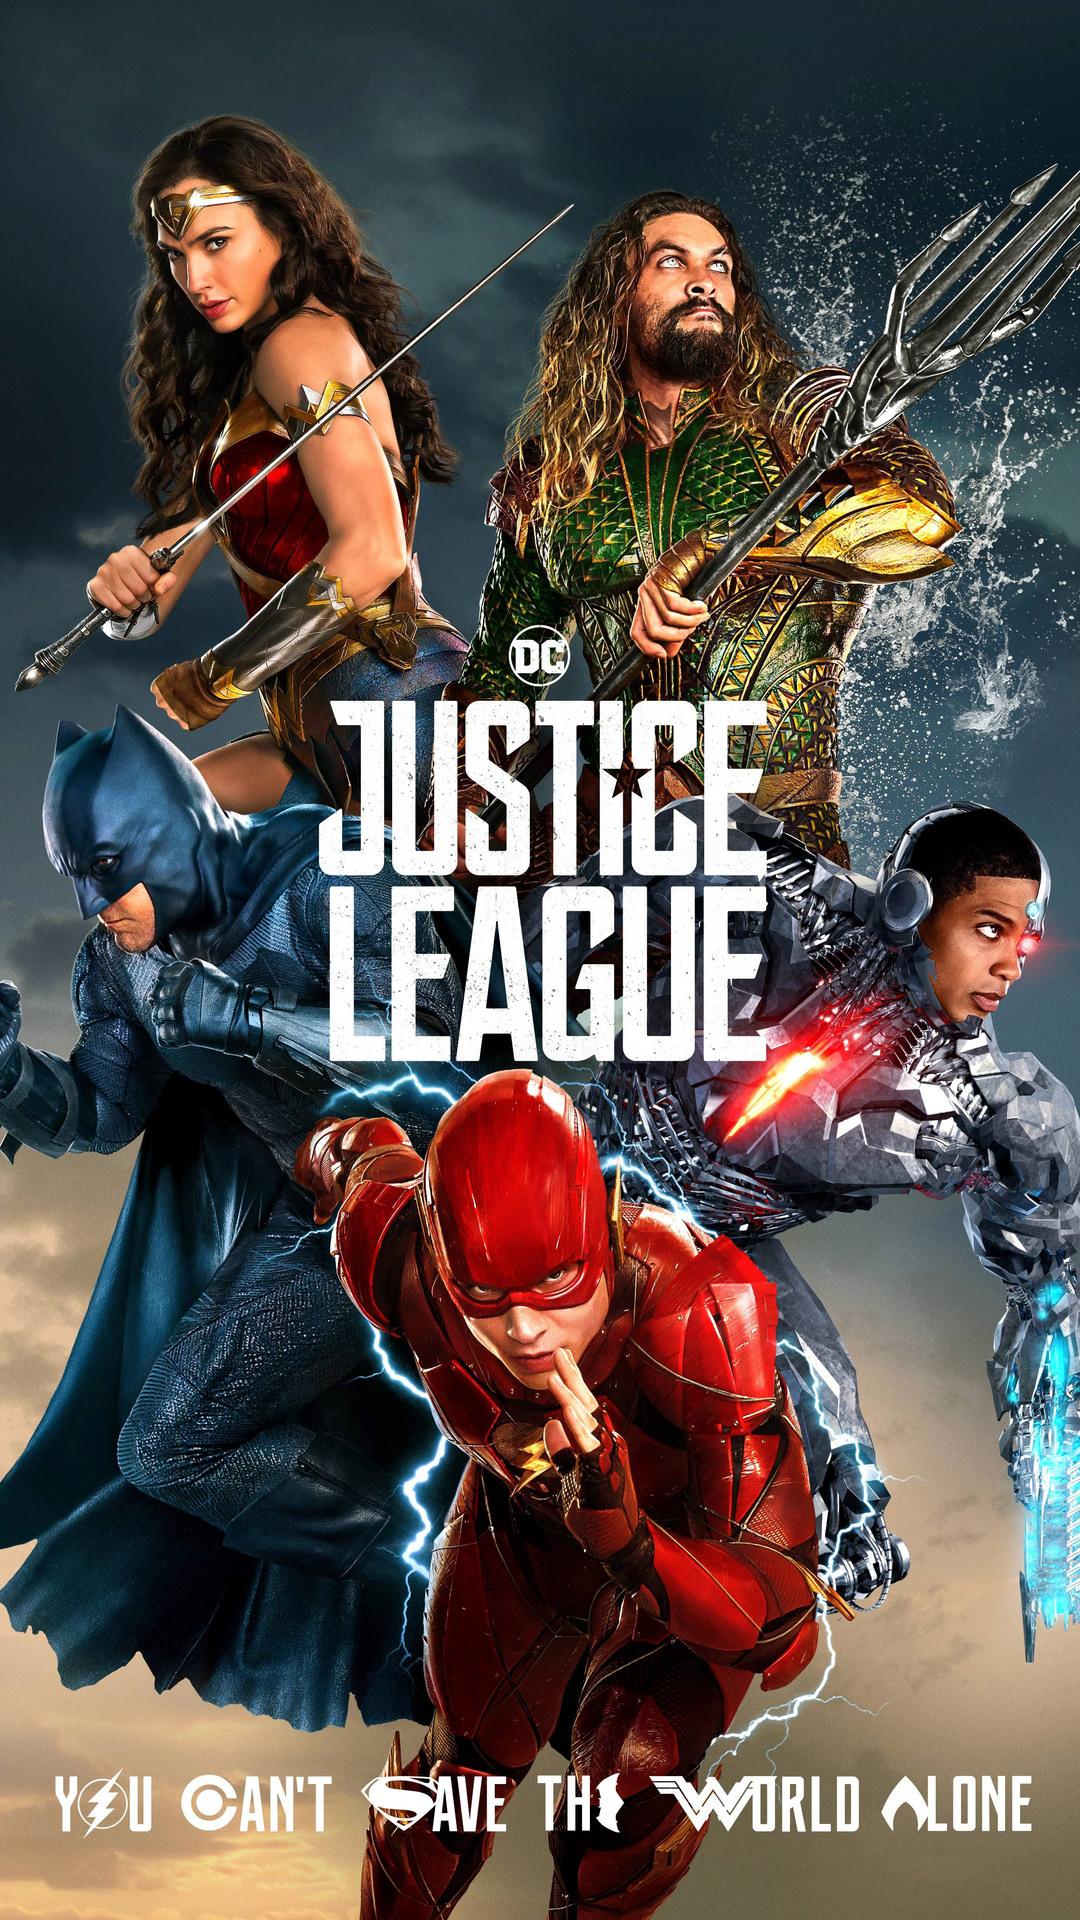 Wonder Woman Aquaman Justice League 2017 Vw